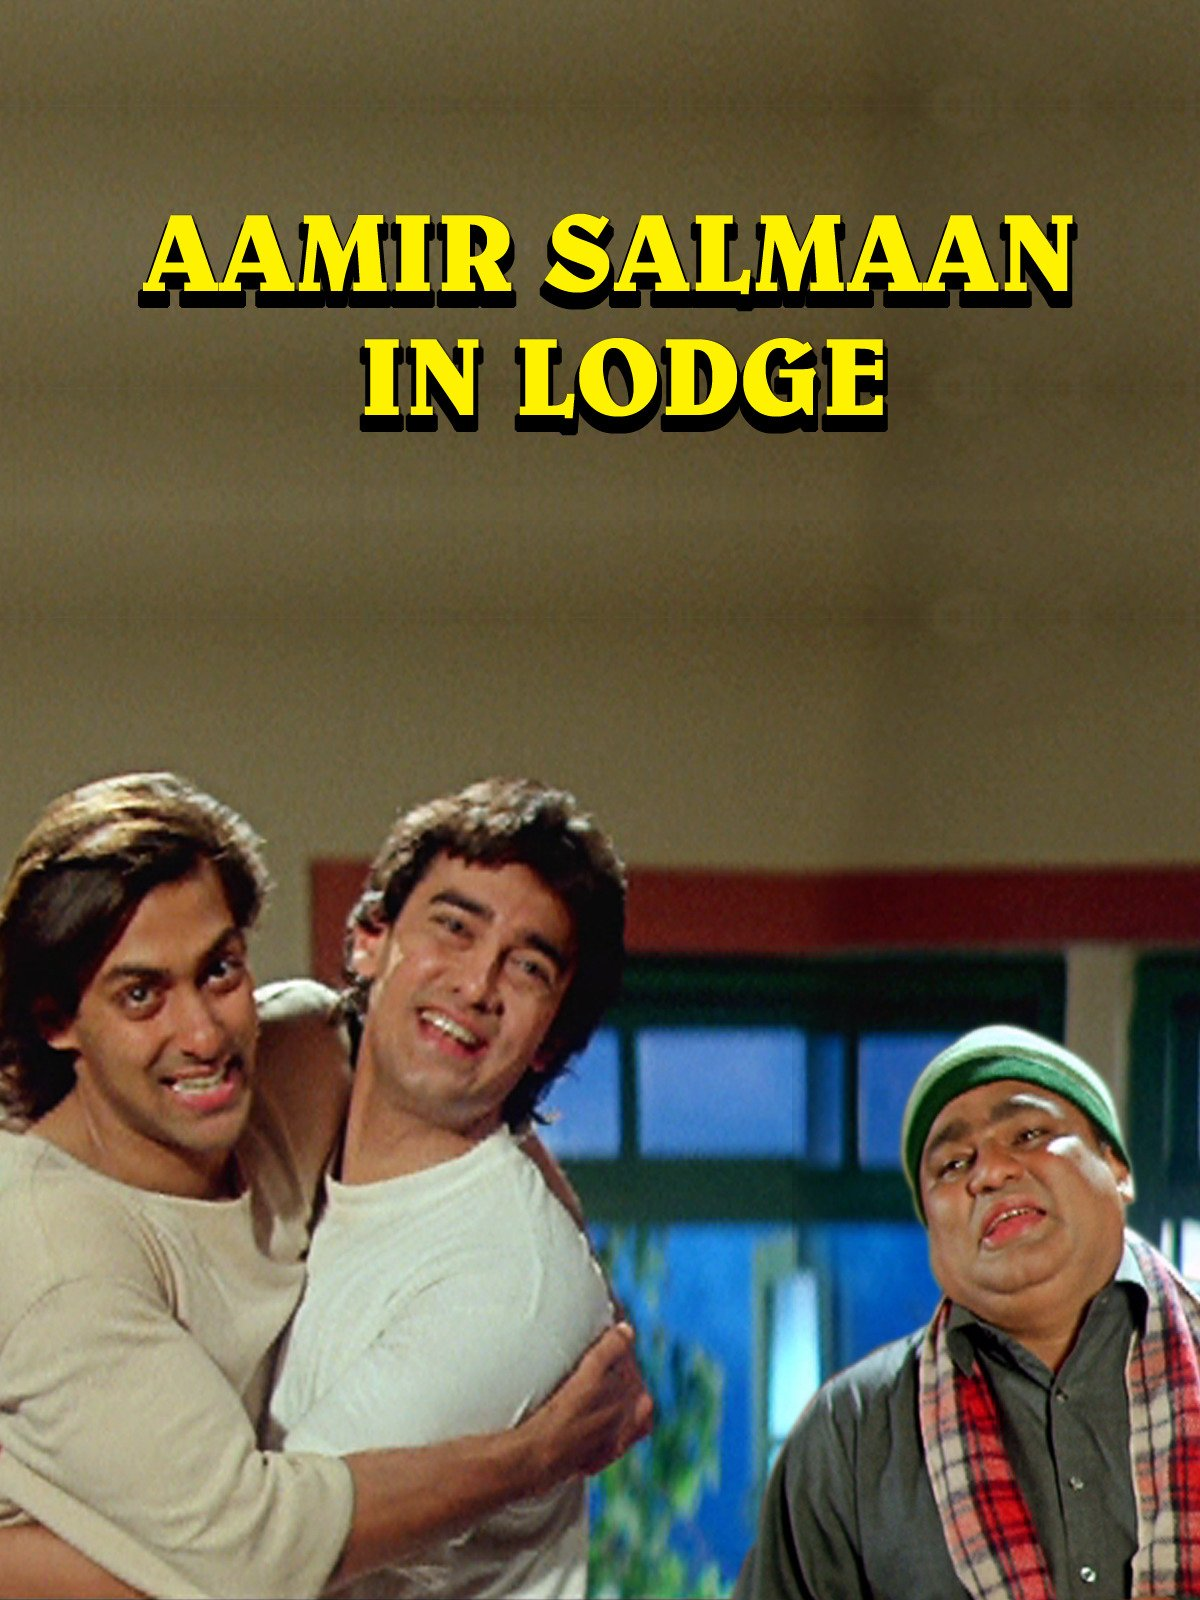 Clip: Aamir Salmaan in Lodge